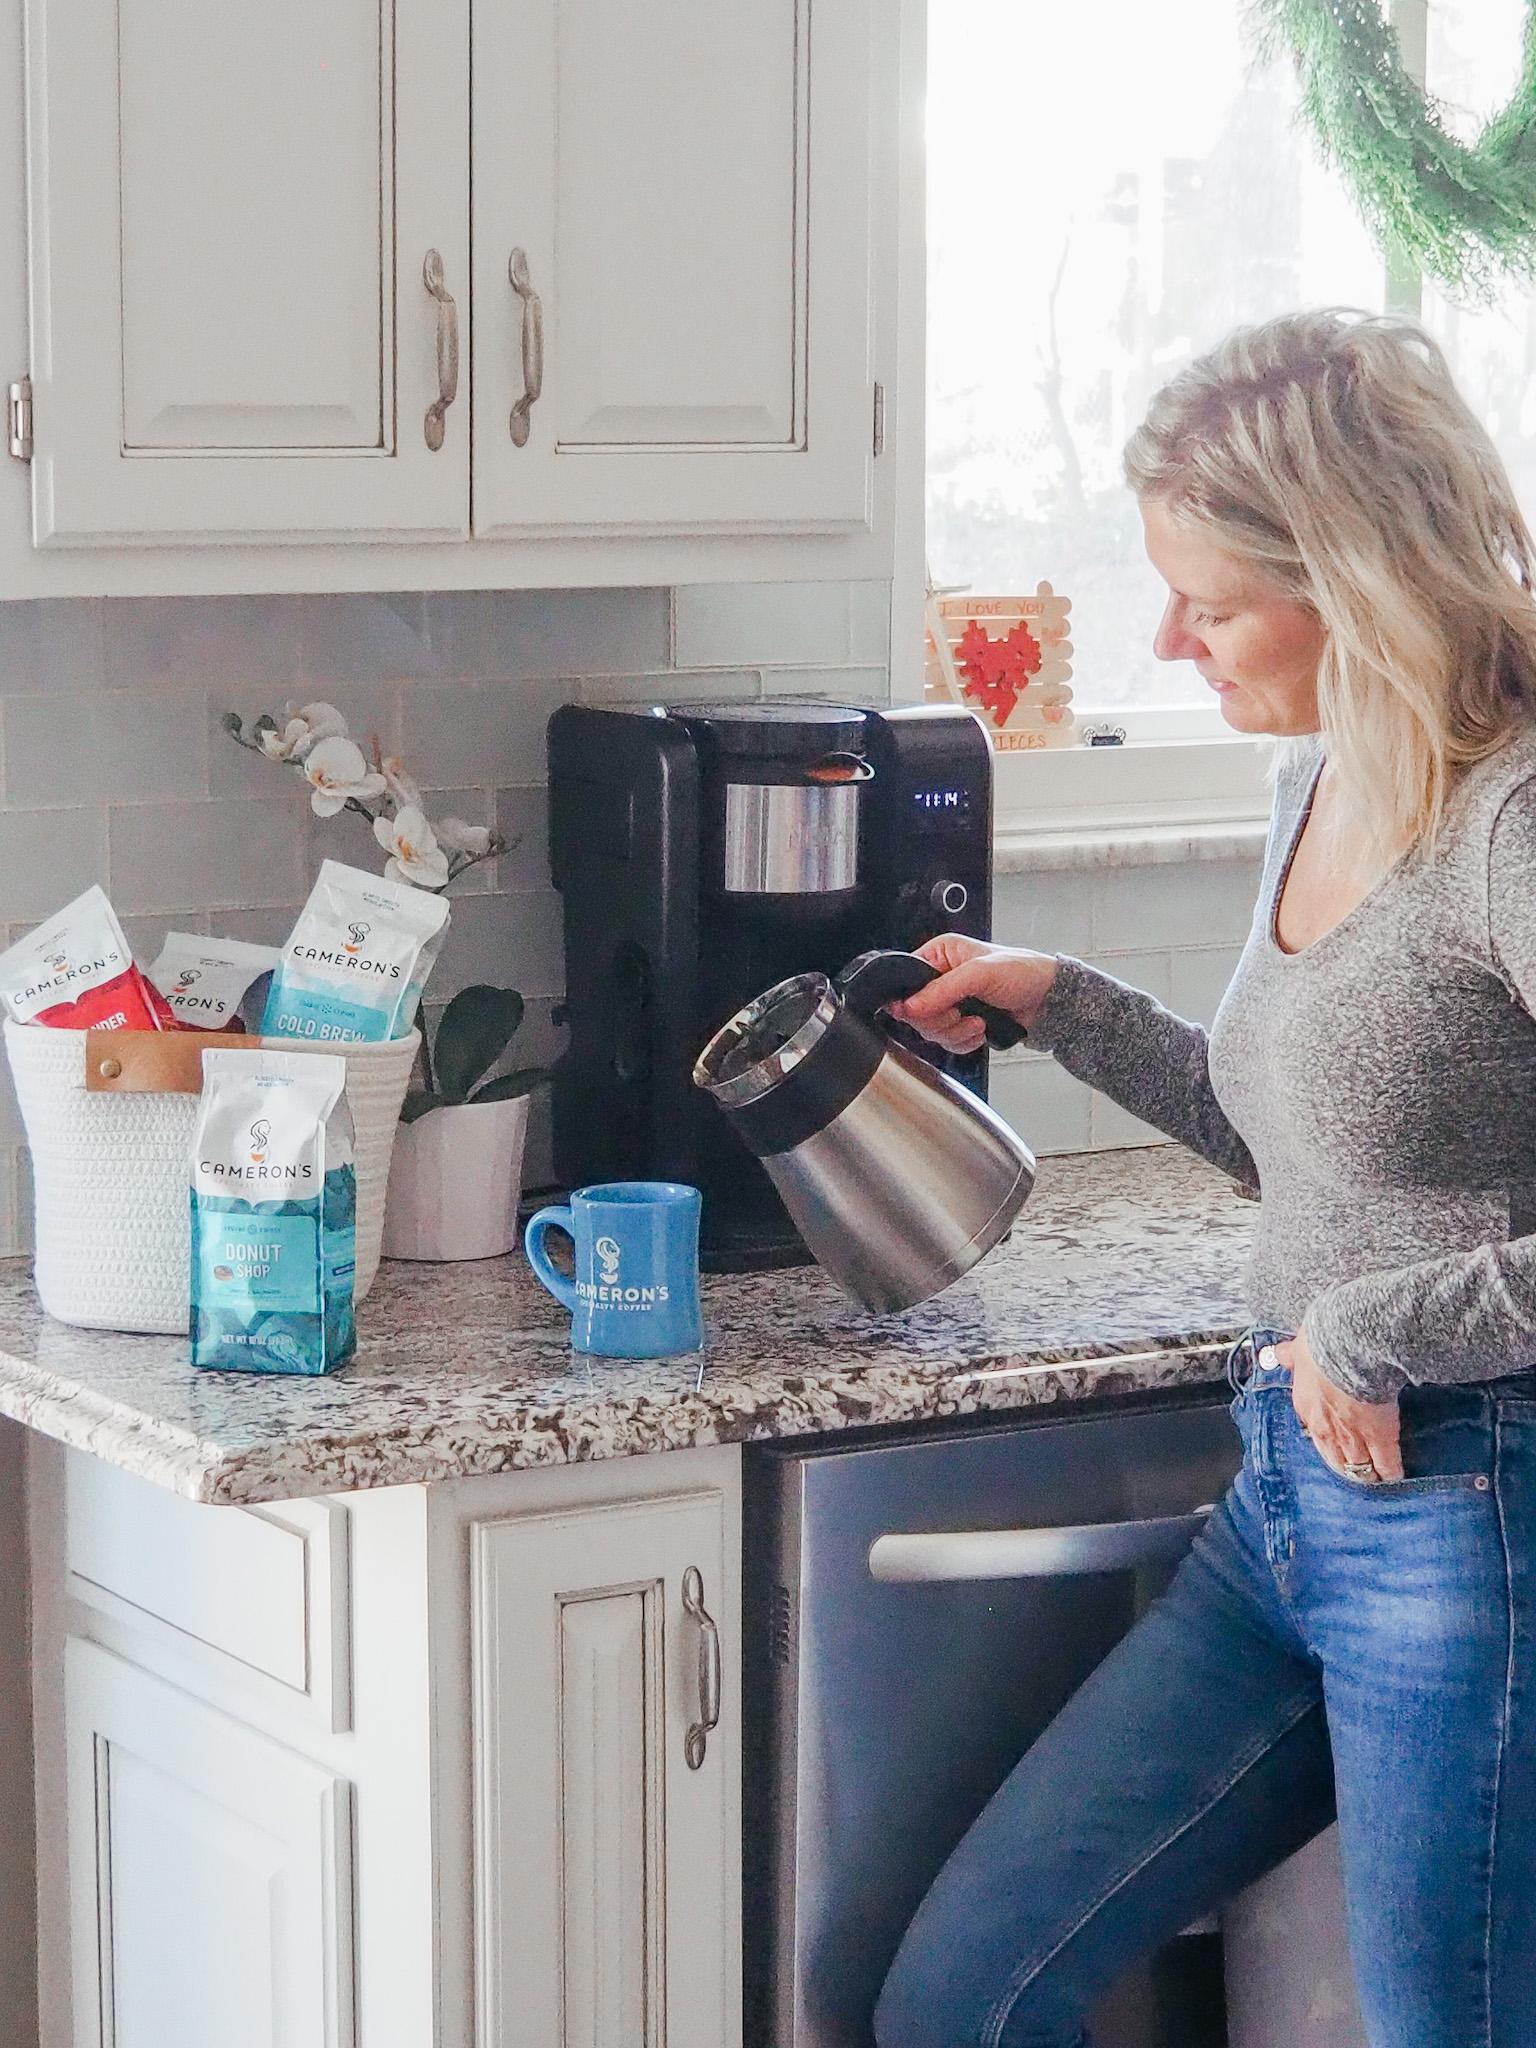 Woman pouring Cameron's Coffee into a mug